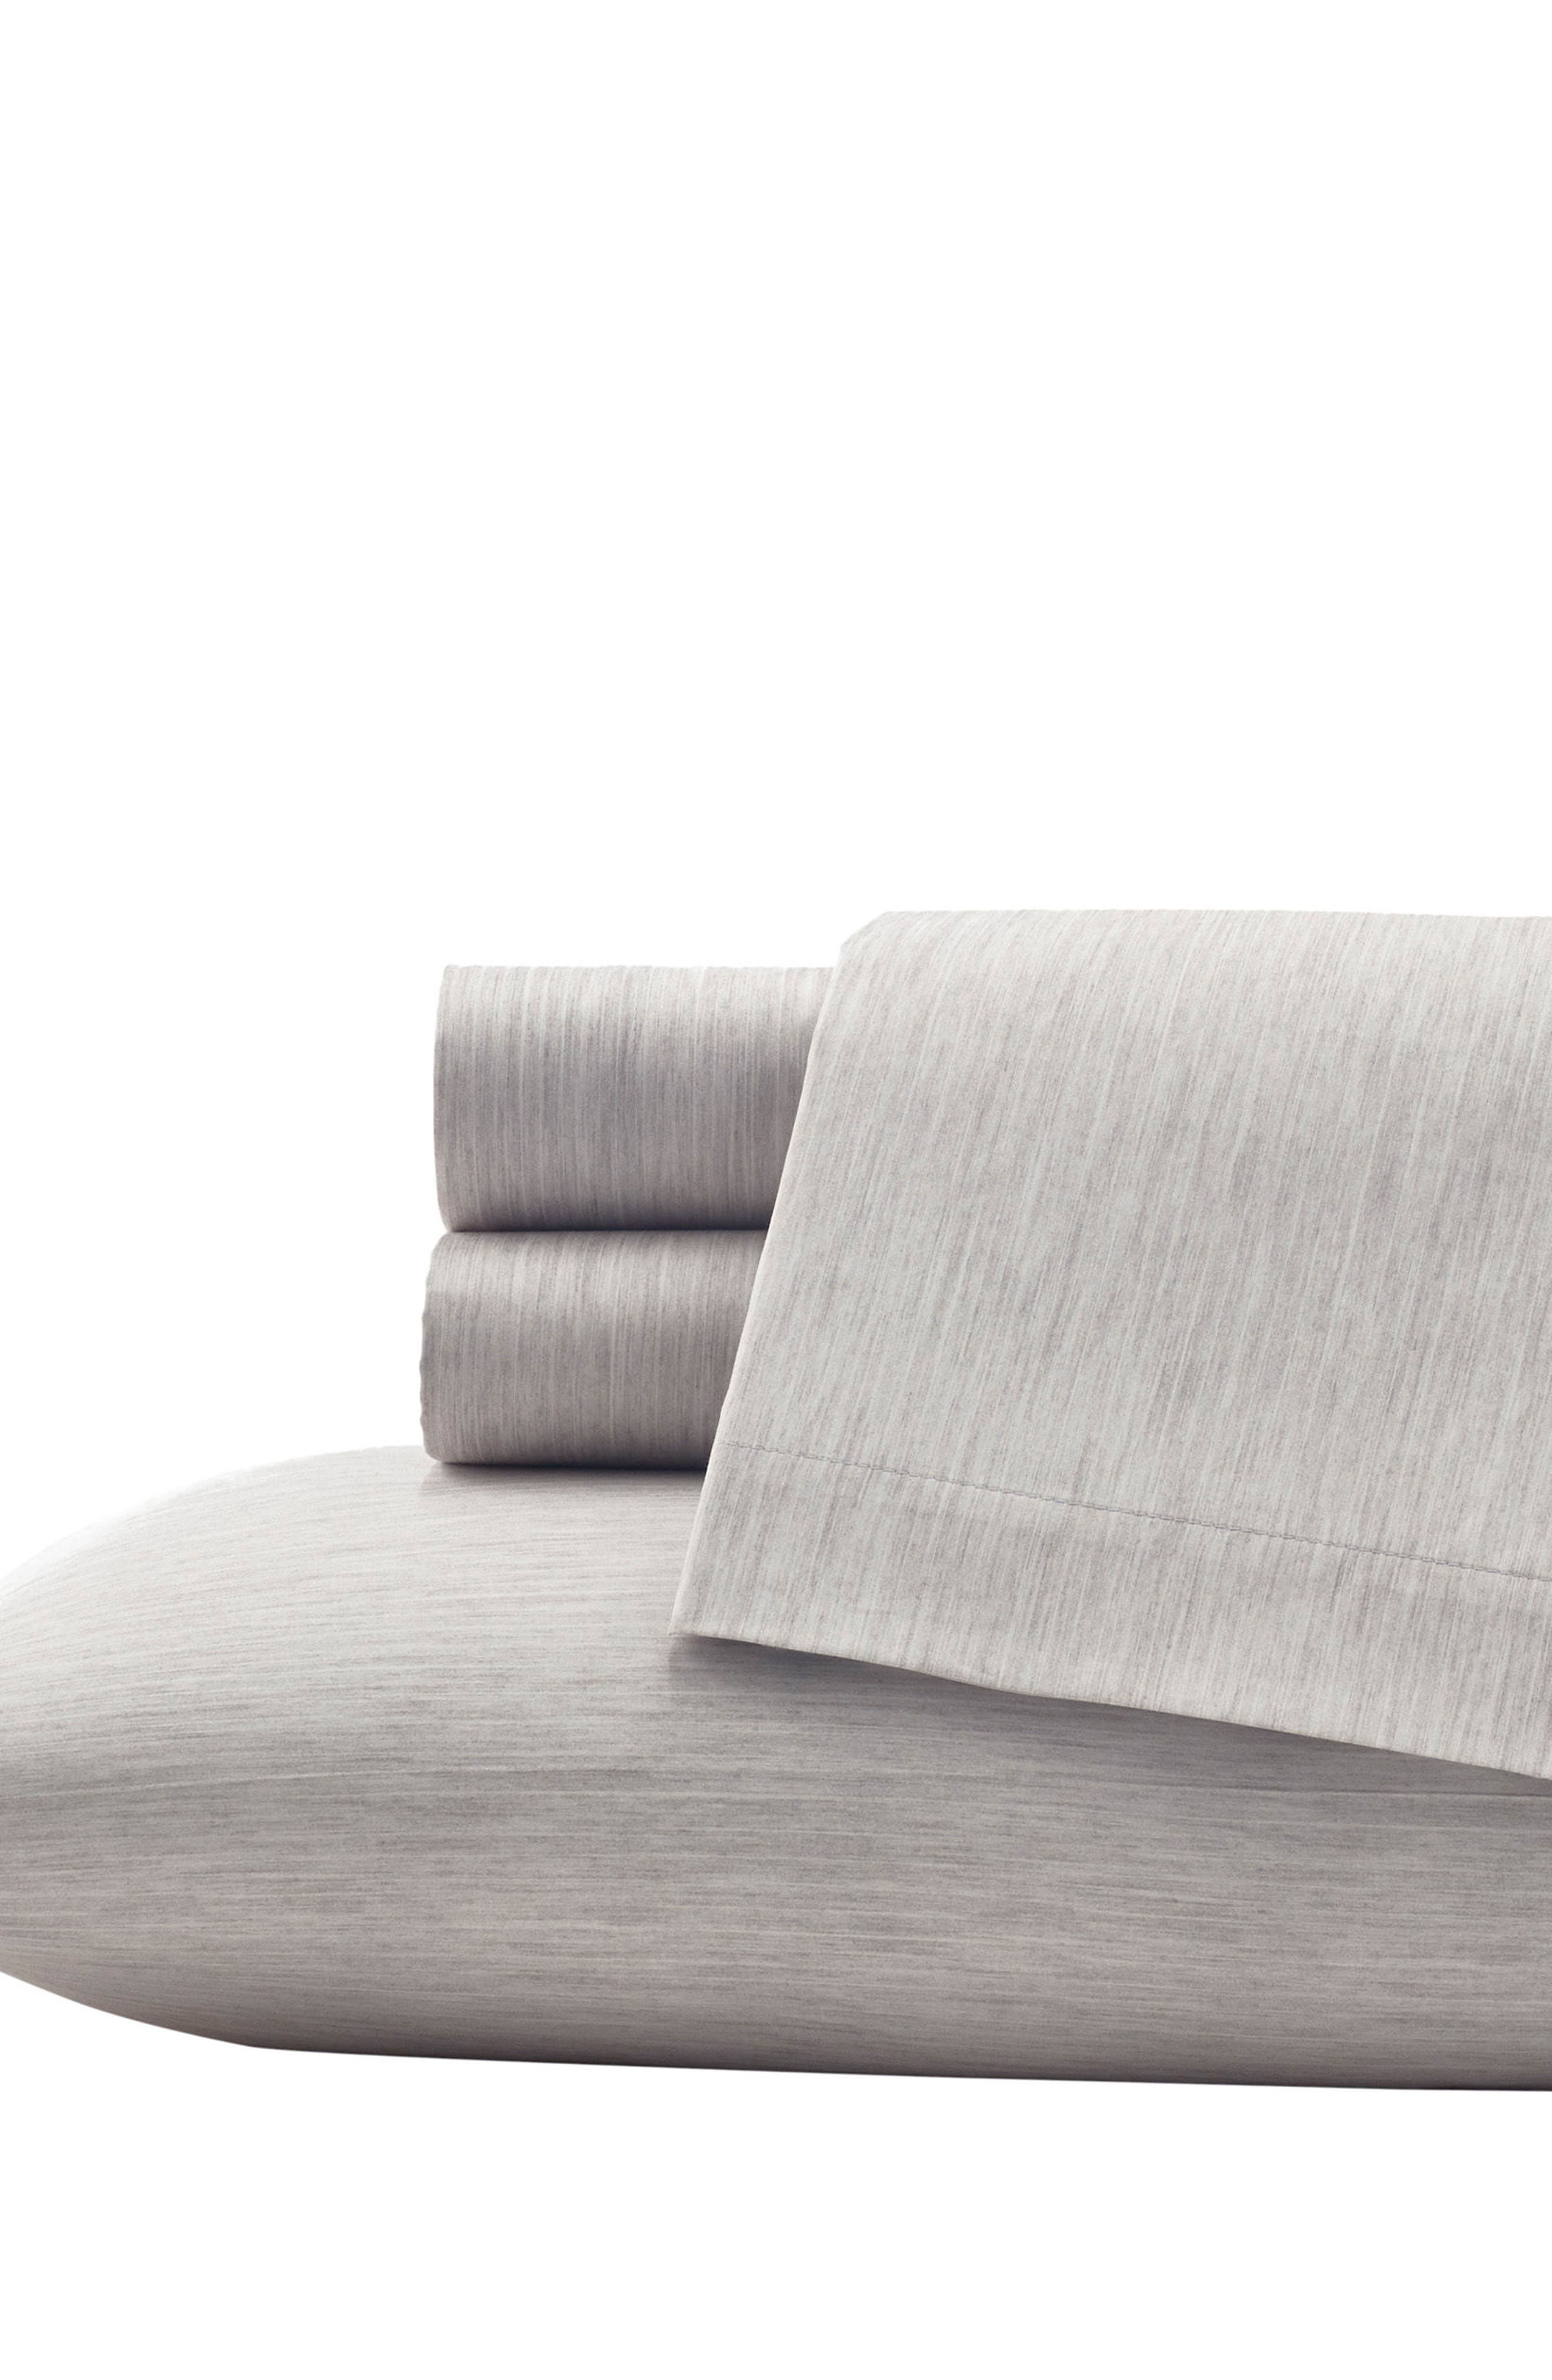 Marble Shibori 300 Thread Count Pillowcases,                             Main thumbnail 1, color,                             Lt/ Gray